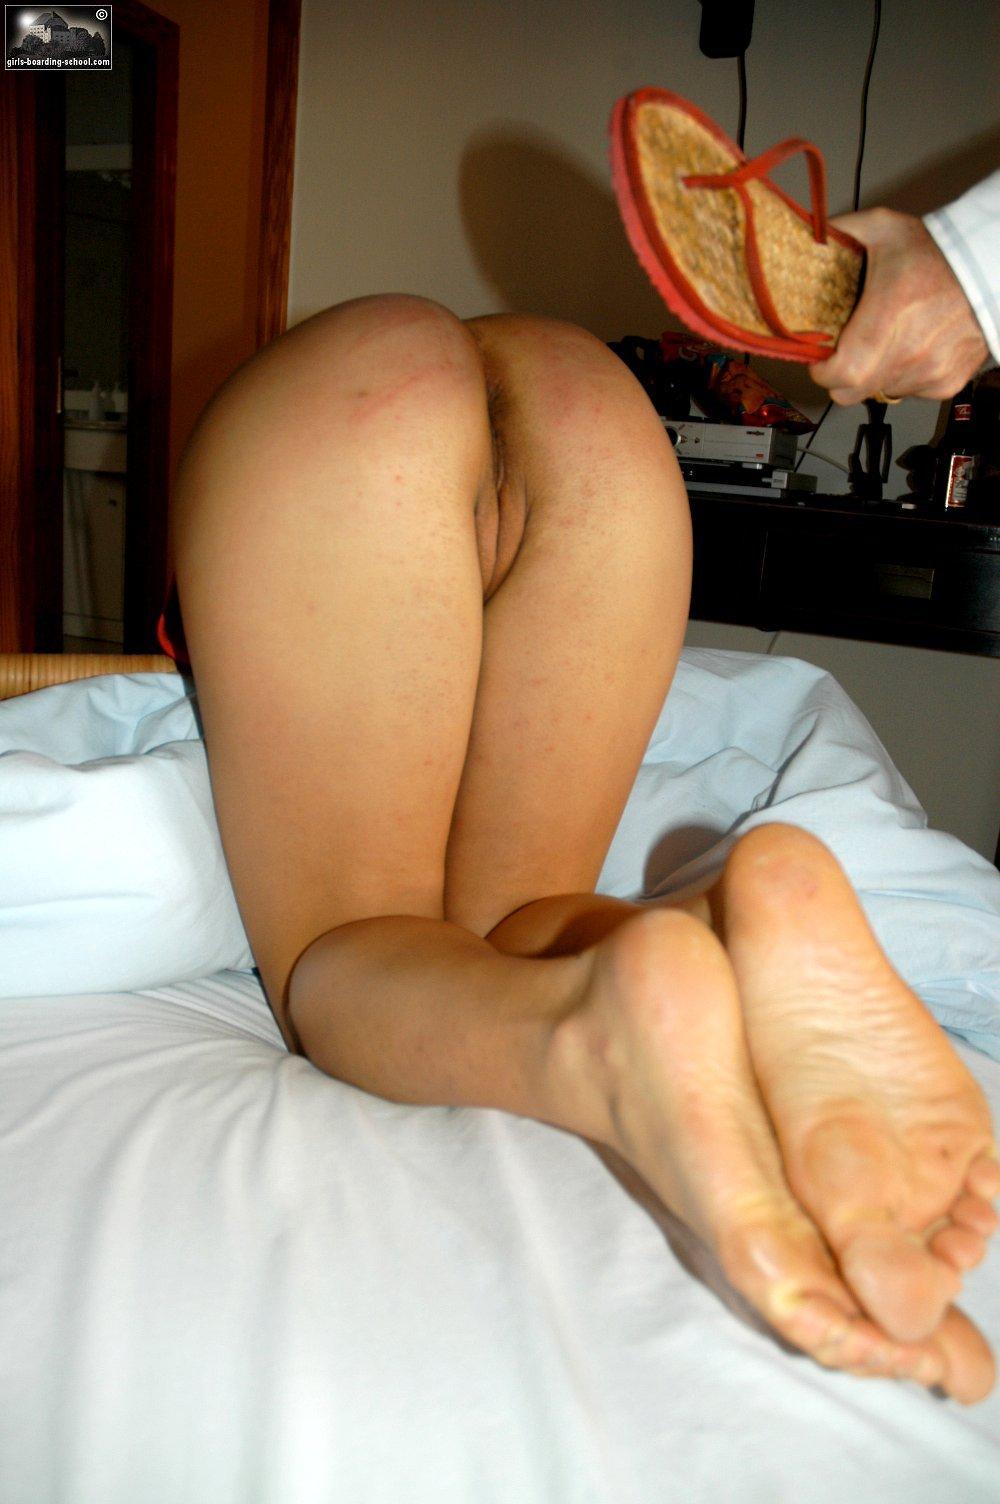 jacqueline macinnes wood actress porn sex pics